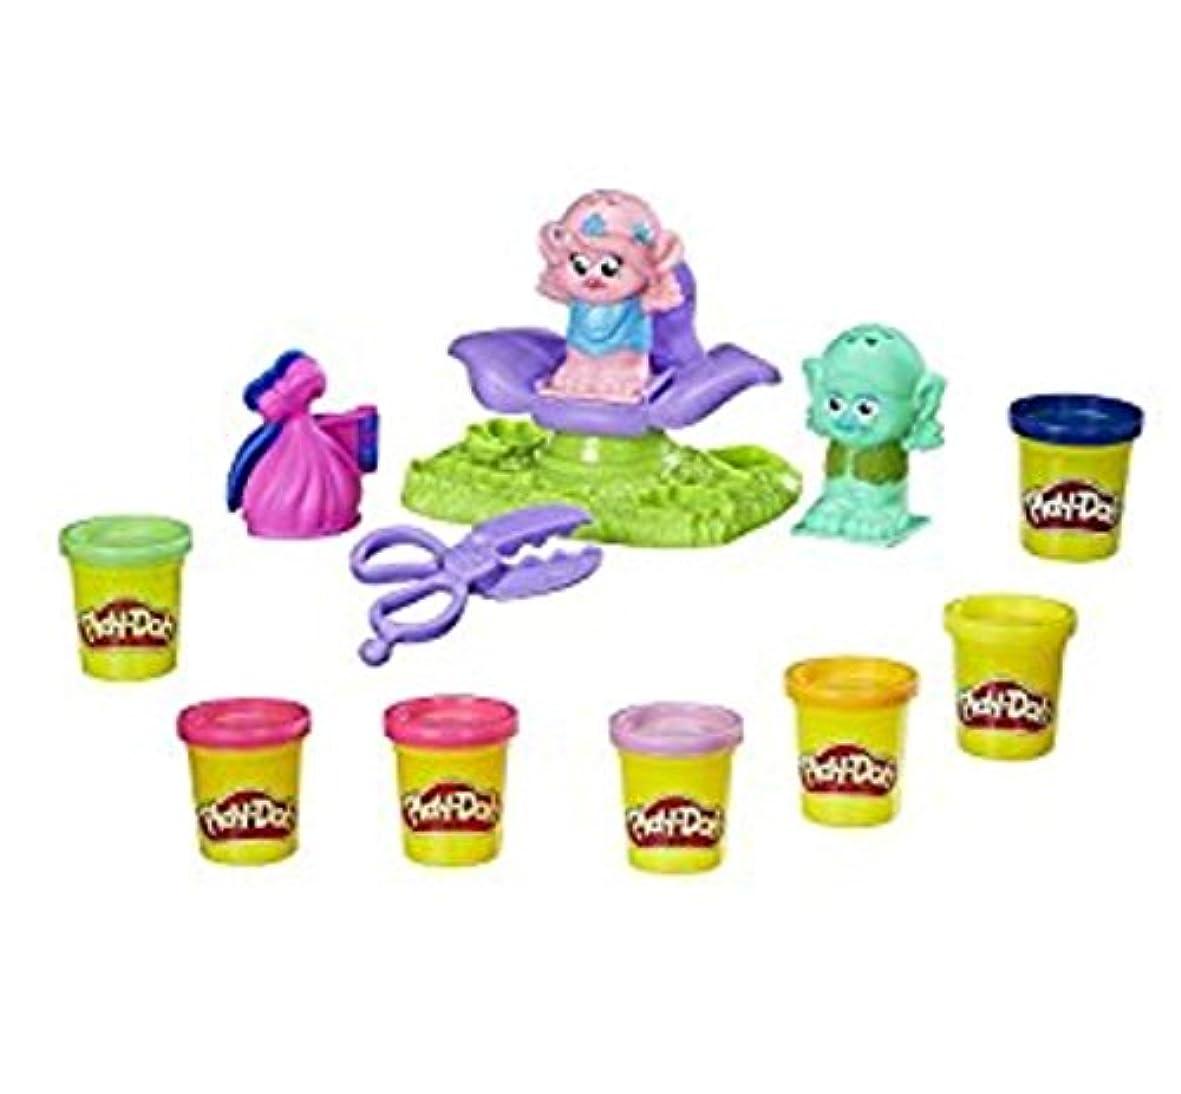 Dreamworks Trolls Play-Doh Press & Style Salon & Extra 4 Pack Play Doh Bundle